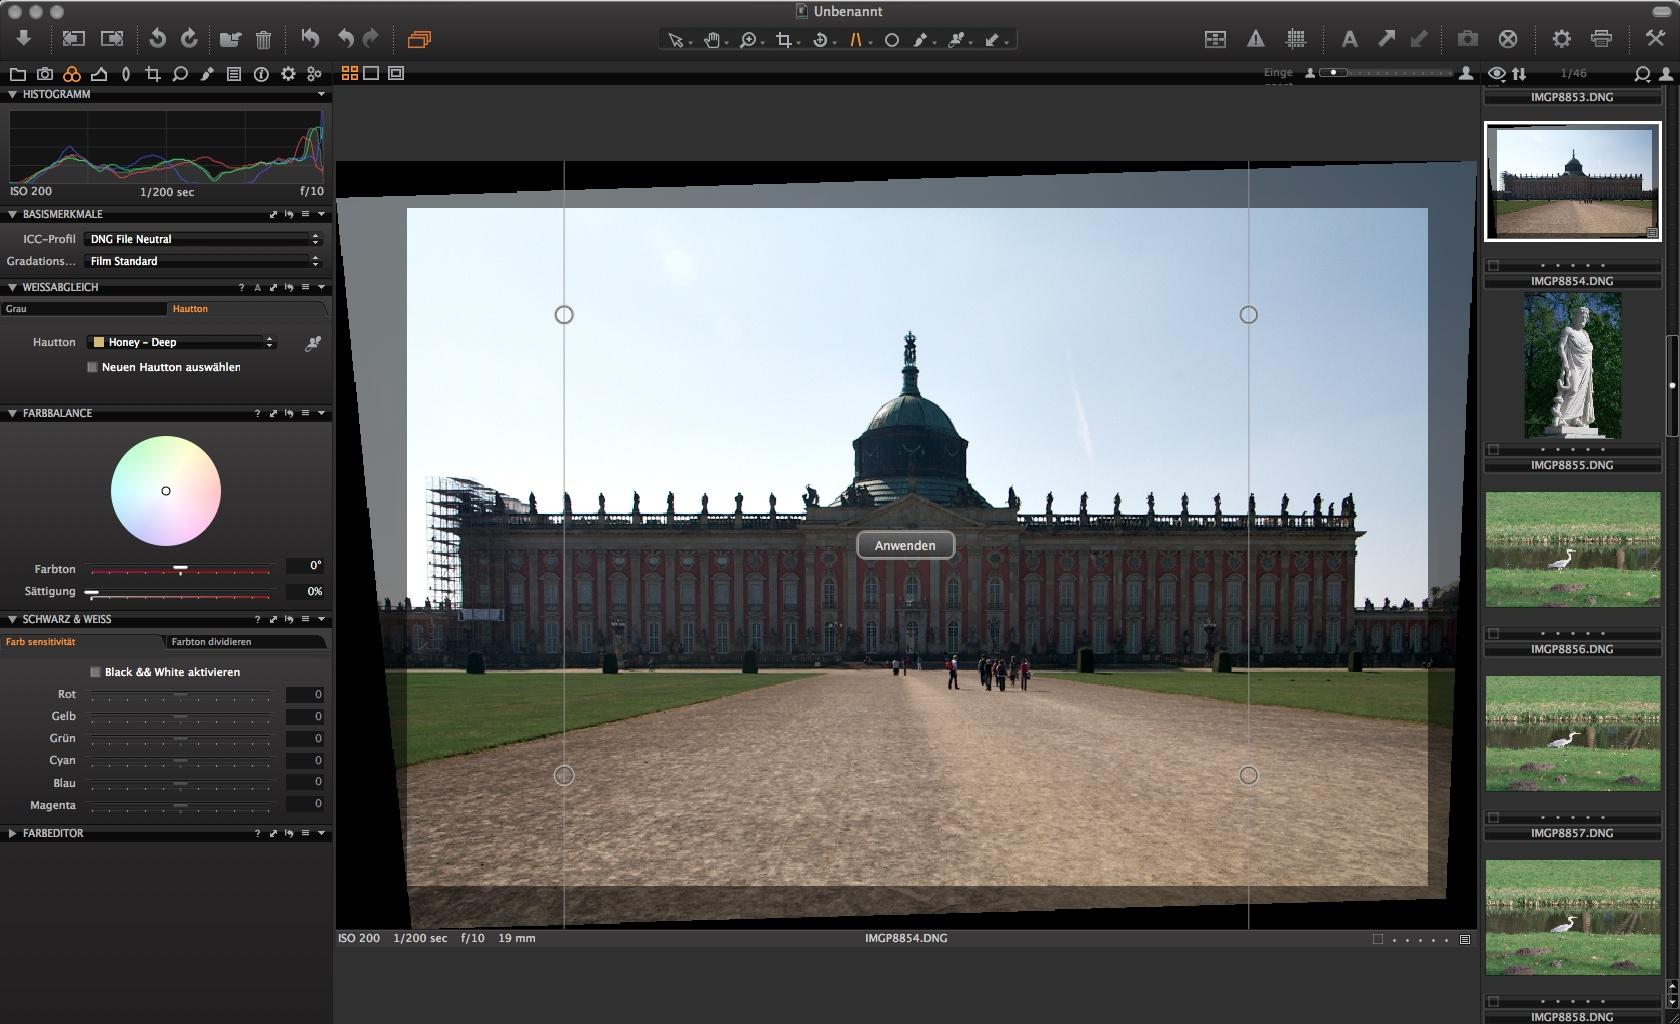 Capture One: Rohdatenentwickler mit Perspektivkorrektur - Phase One Capture One - Perspektivkorrektur (Foto: Andreas Donath)